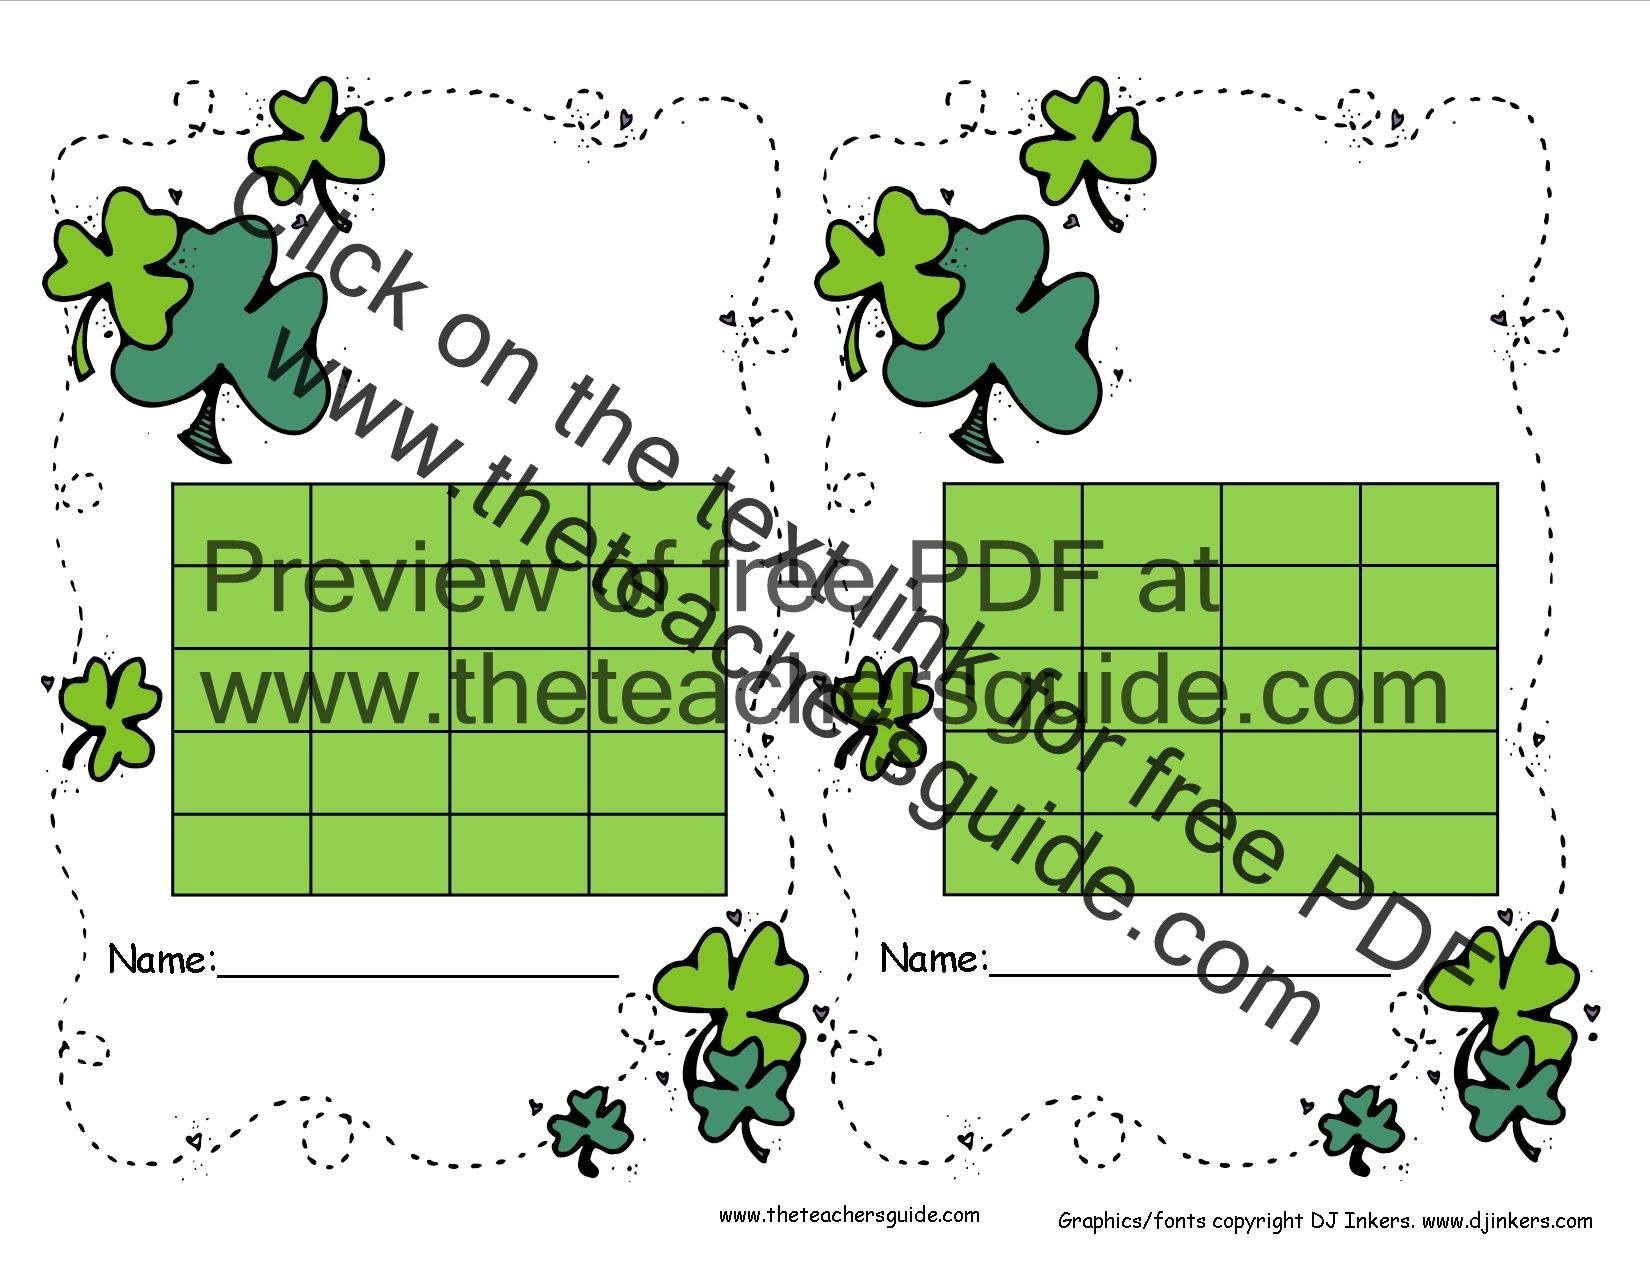 St. Patrick\'s Day Lesson Plans, Themes, Printouts, Crafts